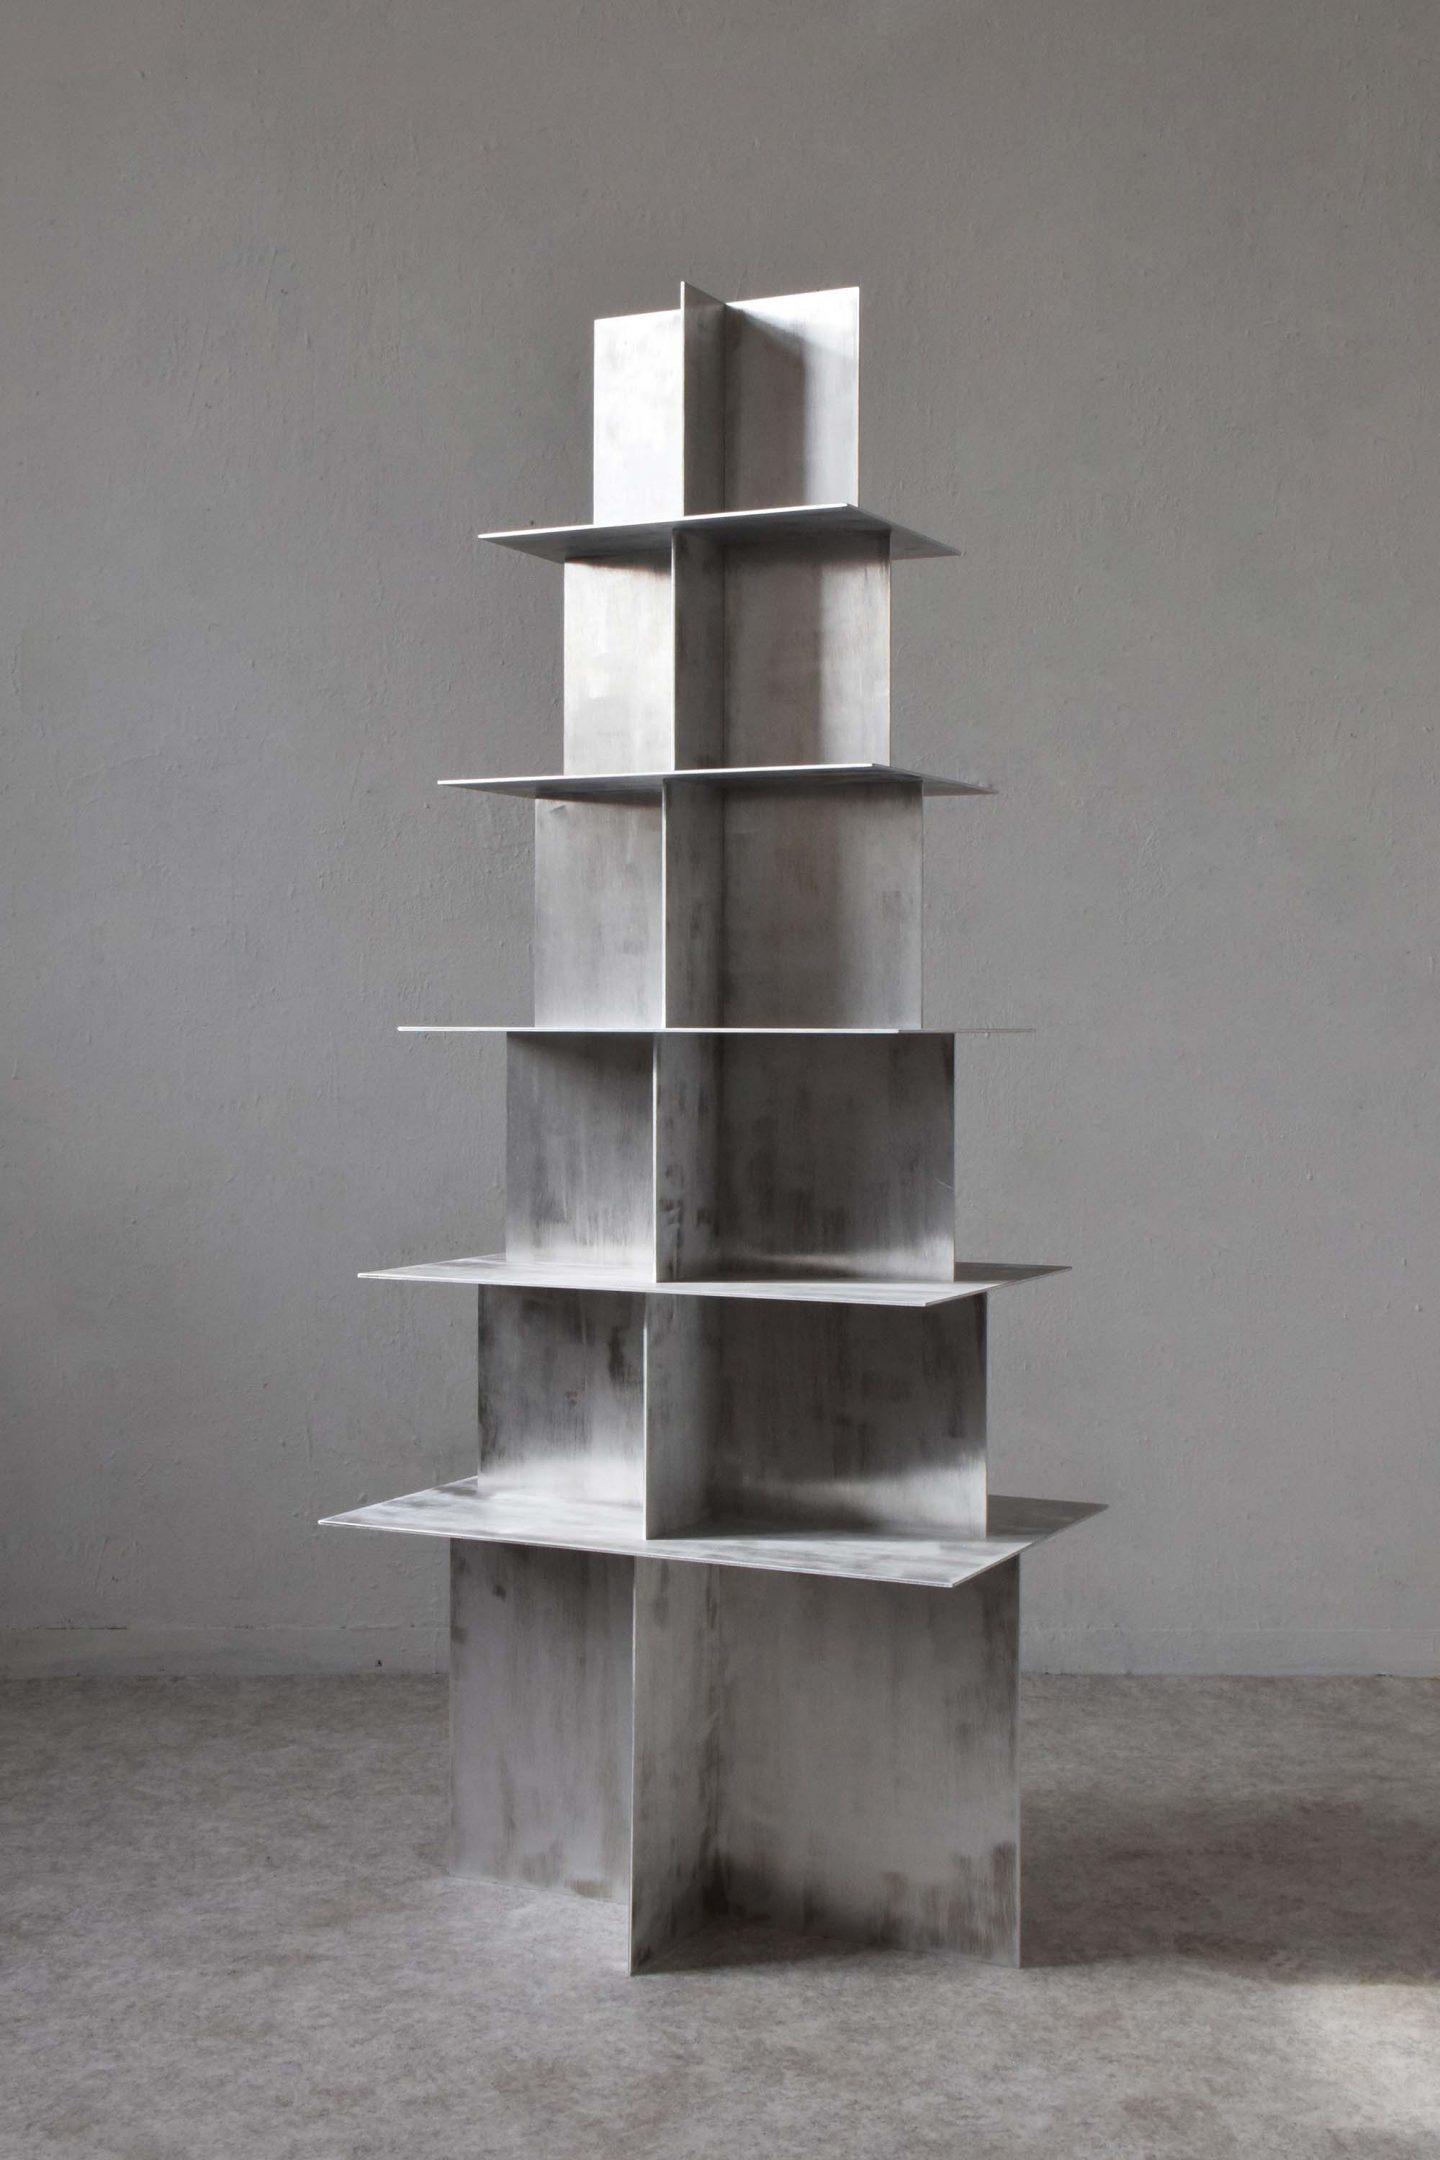 IGNANT-Design-Bram-Vanderbeke-3